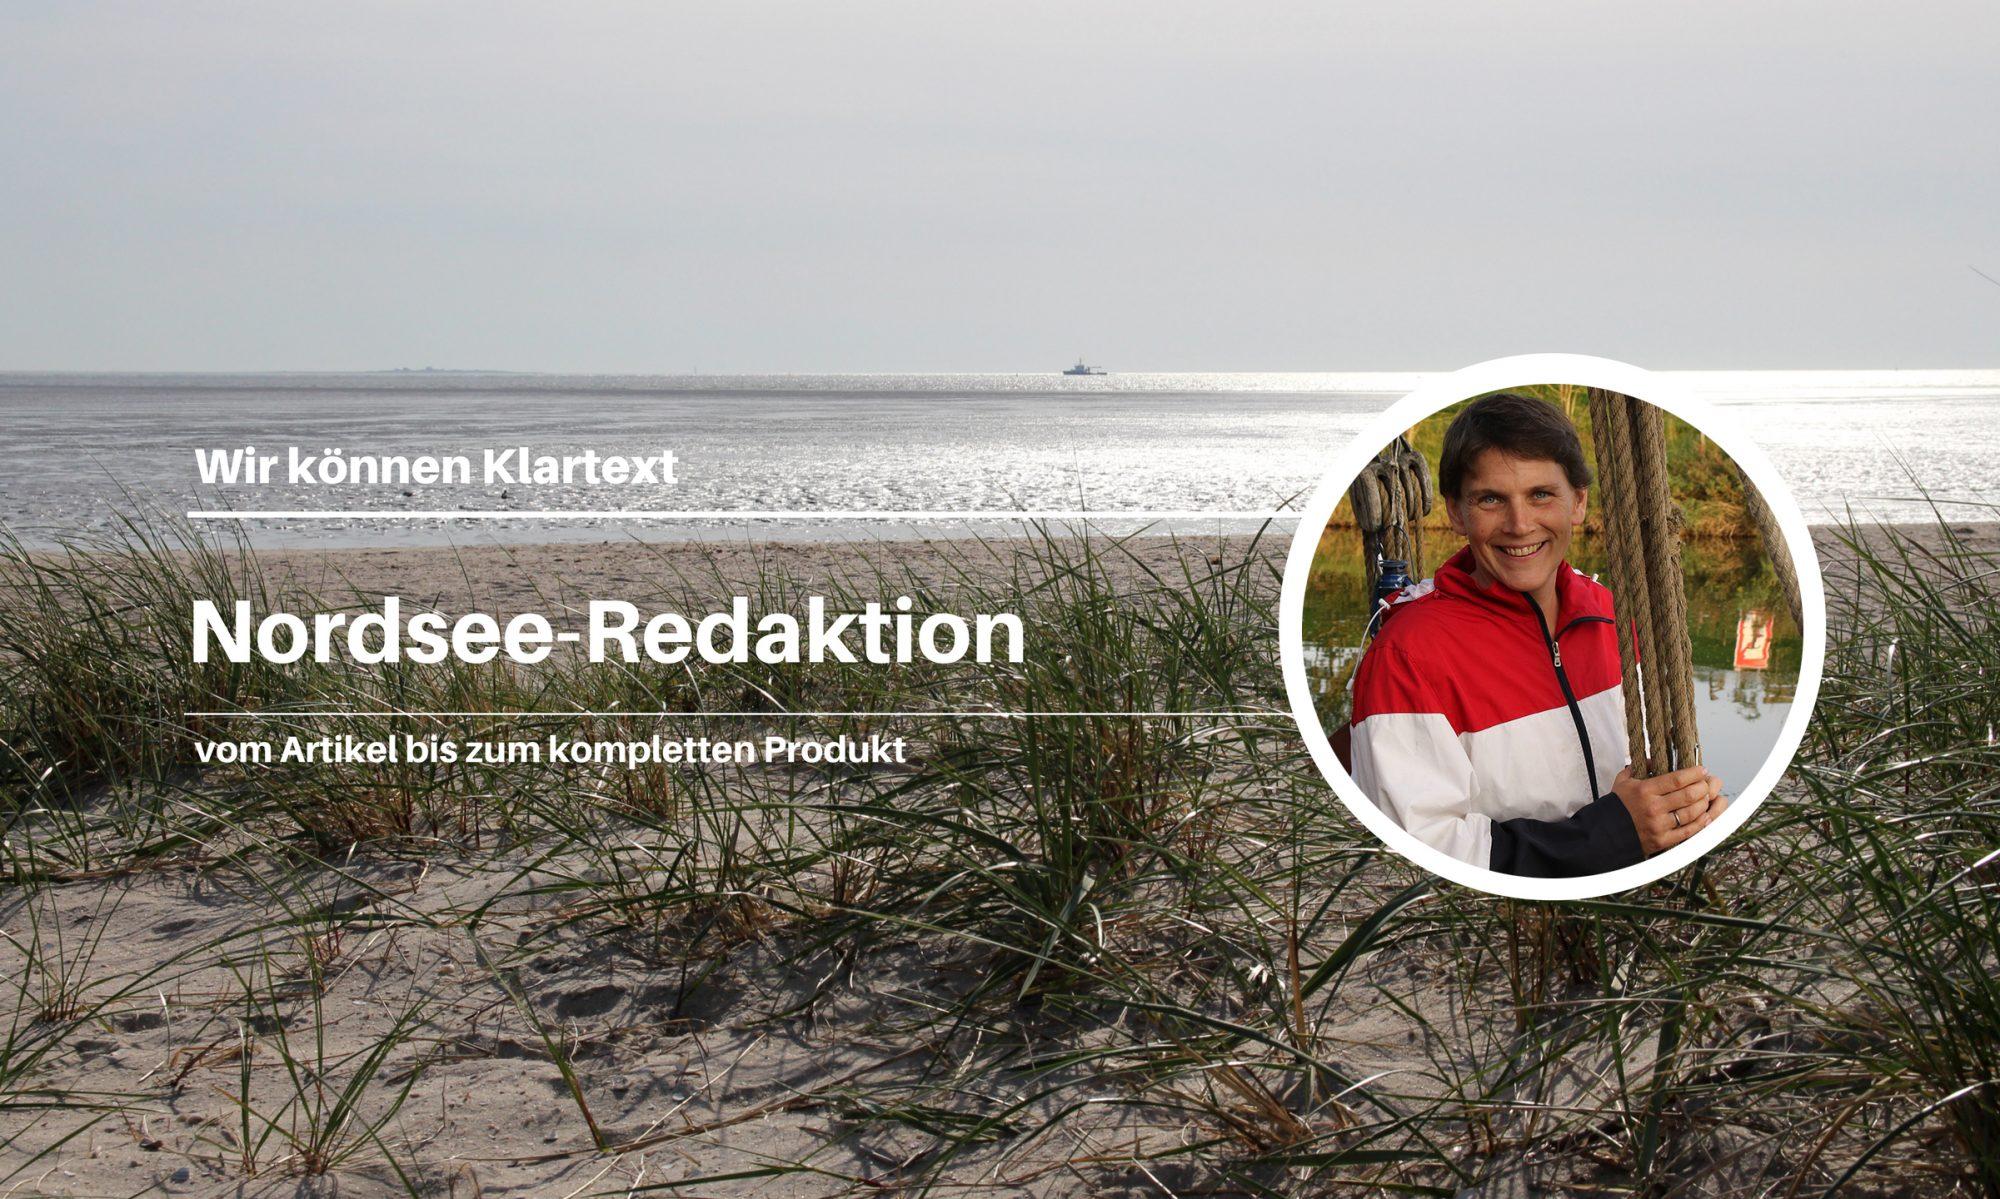 Nordsee-Redaktion